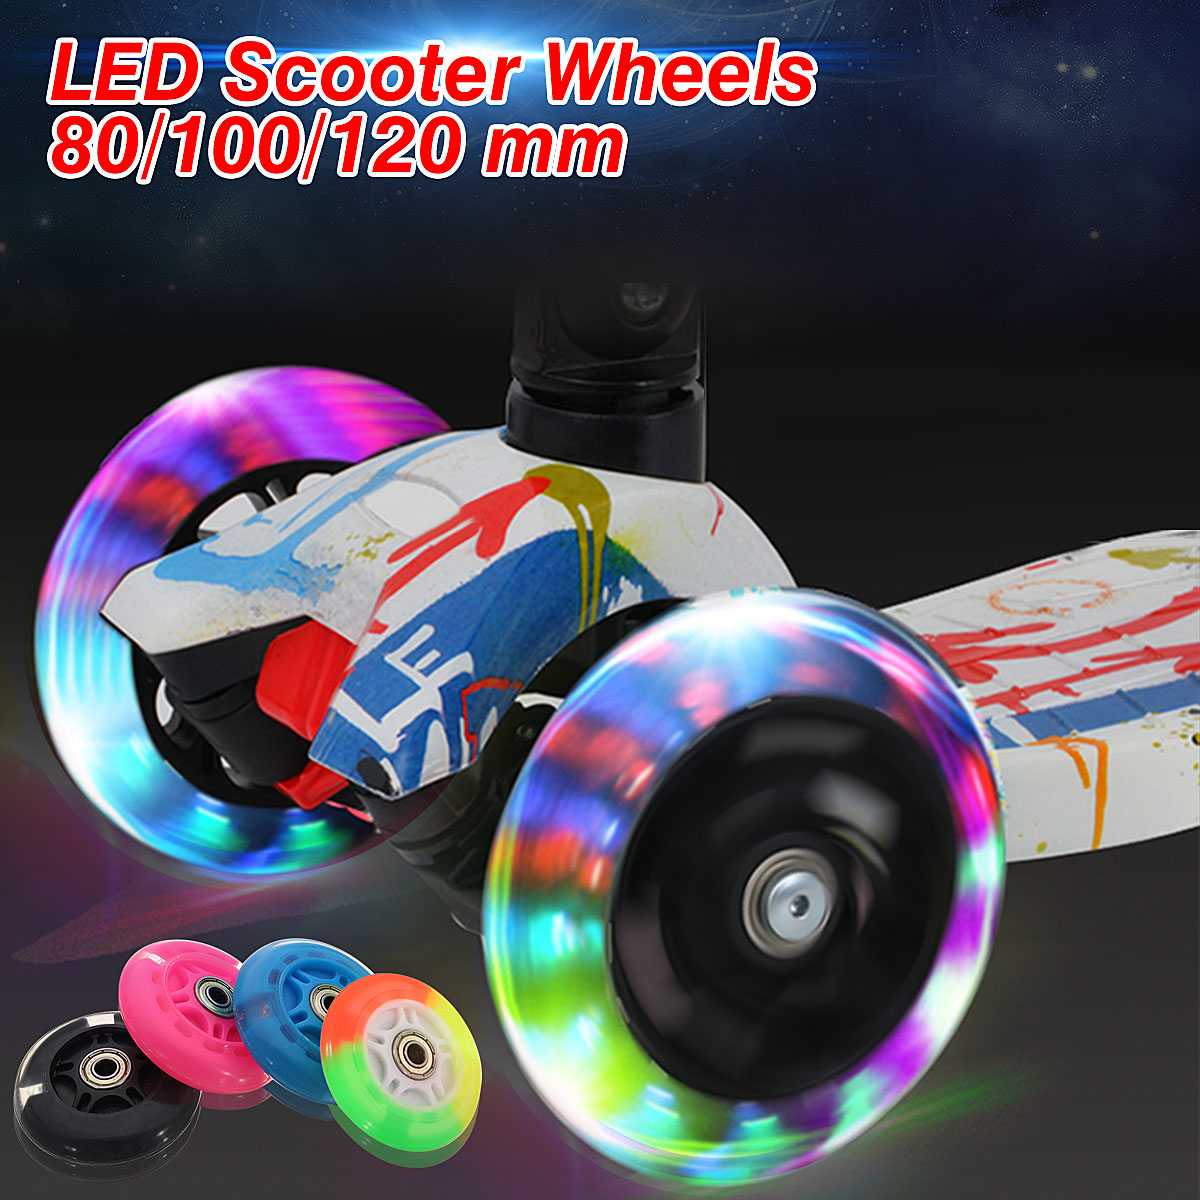 2 stücke Roller Rad LED Flash Light Up Roller Rad für Mini Micro Roller mit 2 ABED-7 Lager 80mm 100mm 120mm